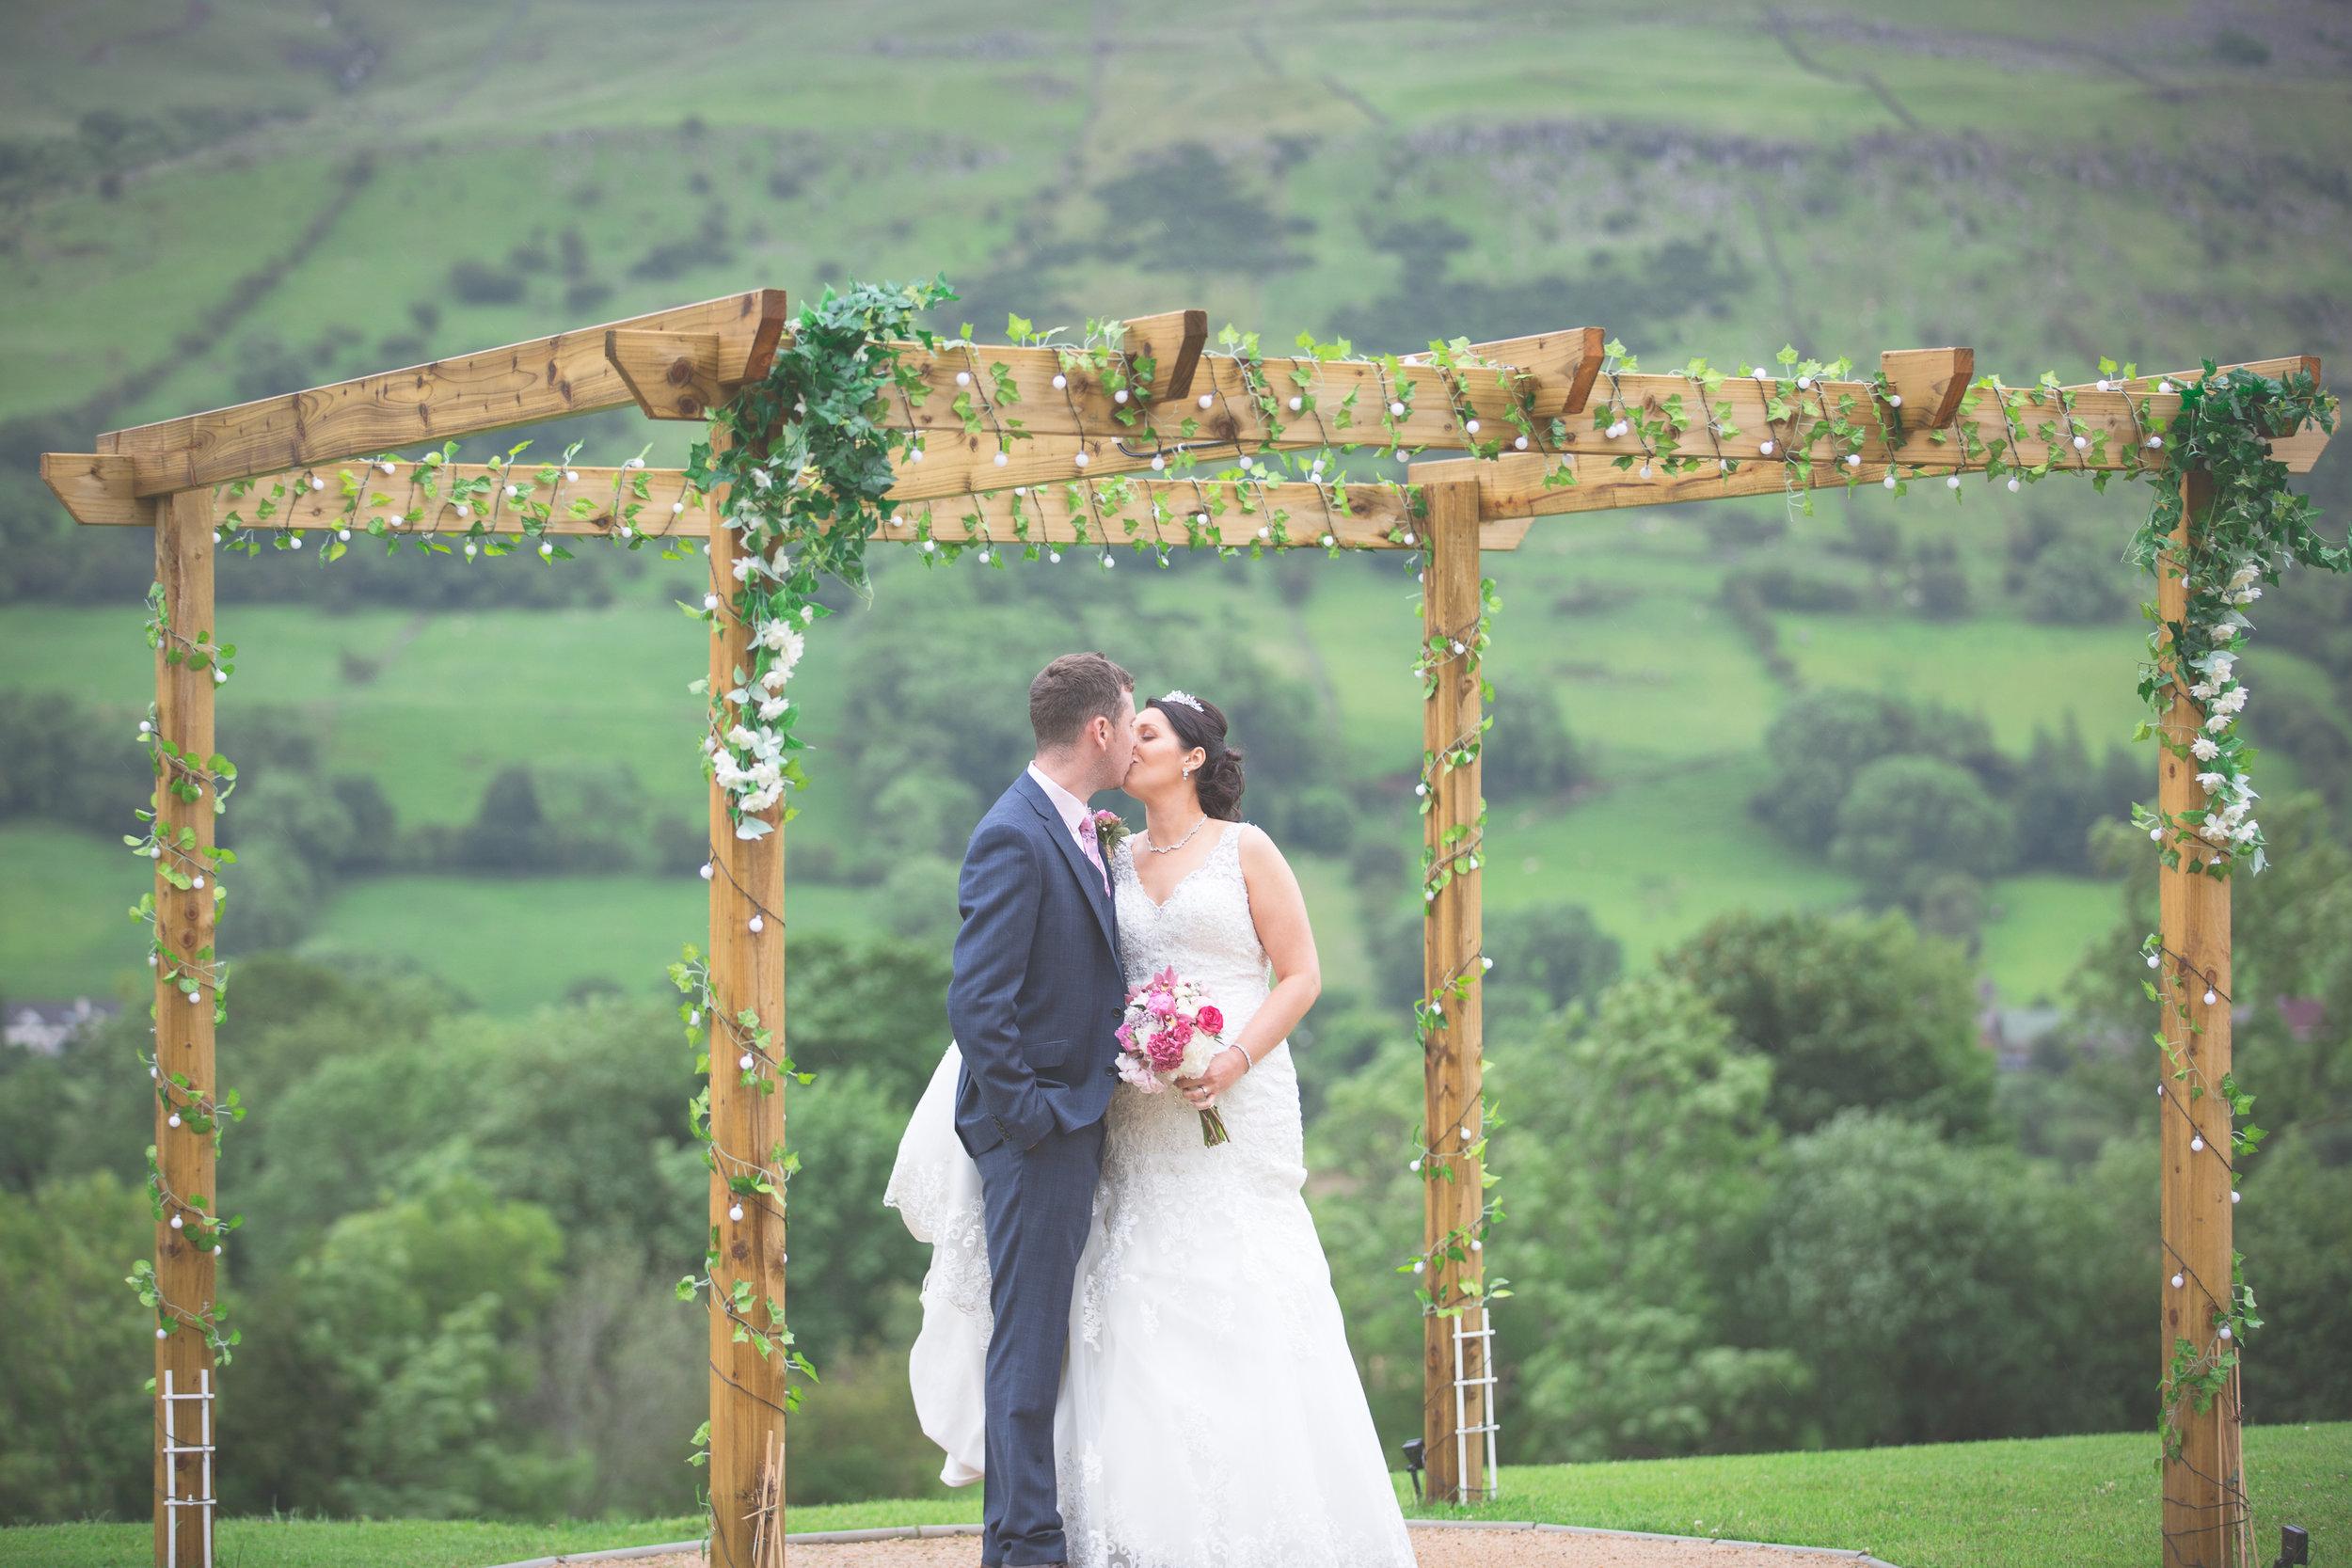 Northern Ireland Wedding Photographer | Brian McEwan | Louise & Darren-280.jpg